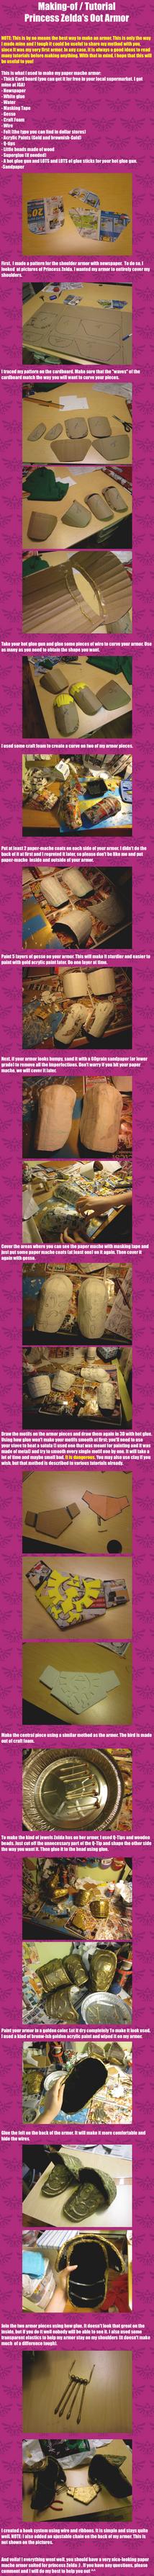 Making-of / Tutorial of Princess Zelda's OoT armor by Kisshu-Neko